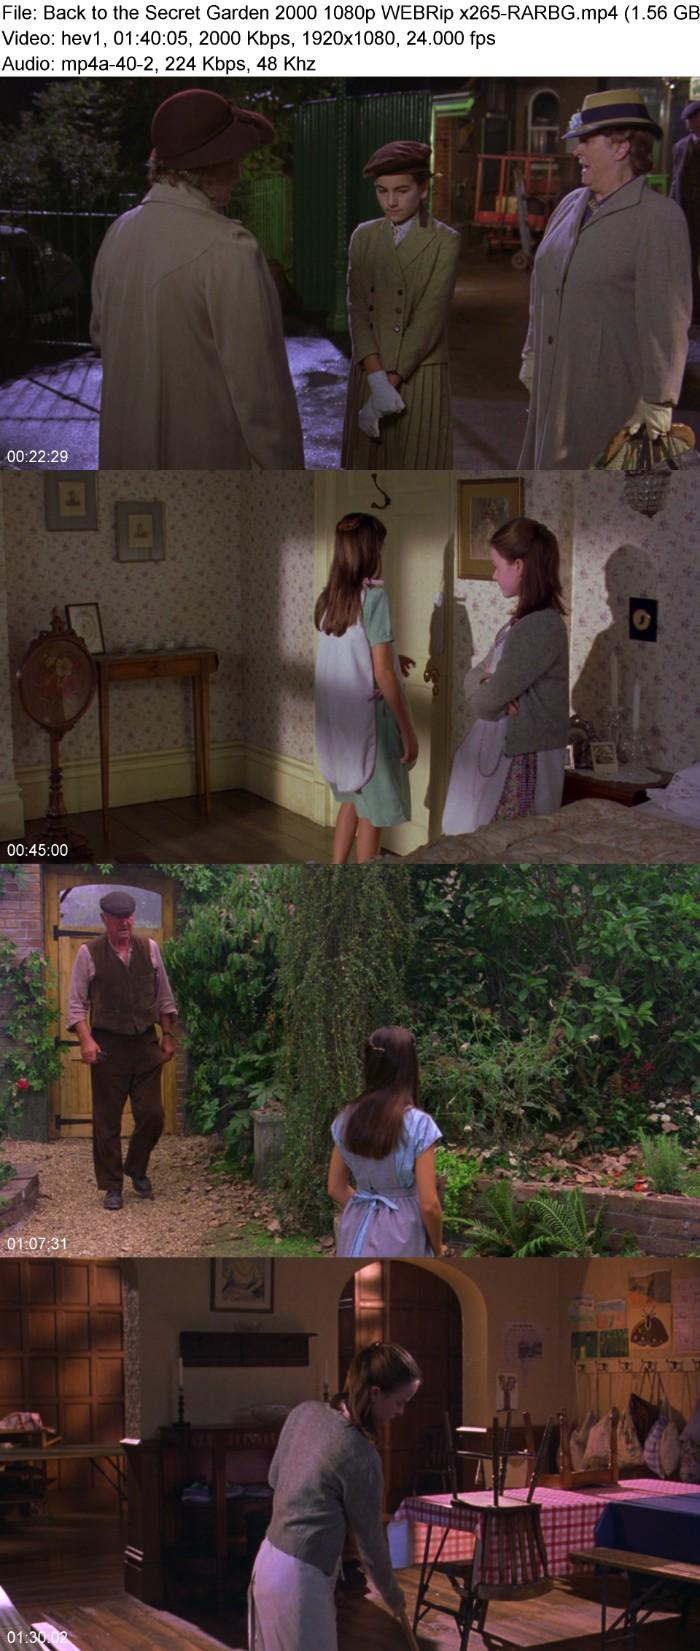 217021213_back-to-the-secret-garden-2000-1080p-webrip-x265-rarbg.jpg